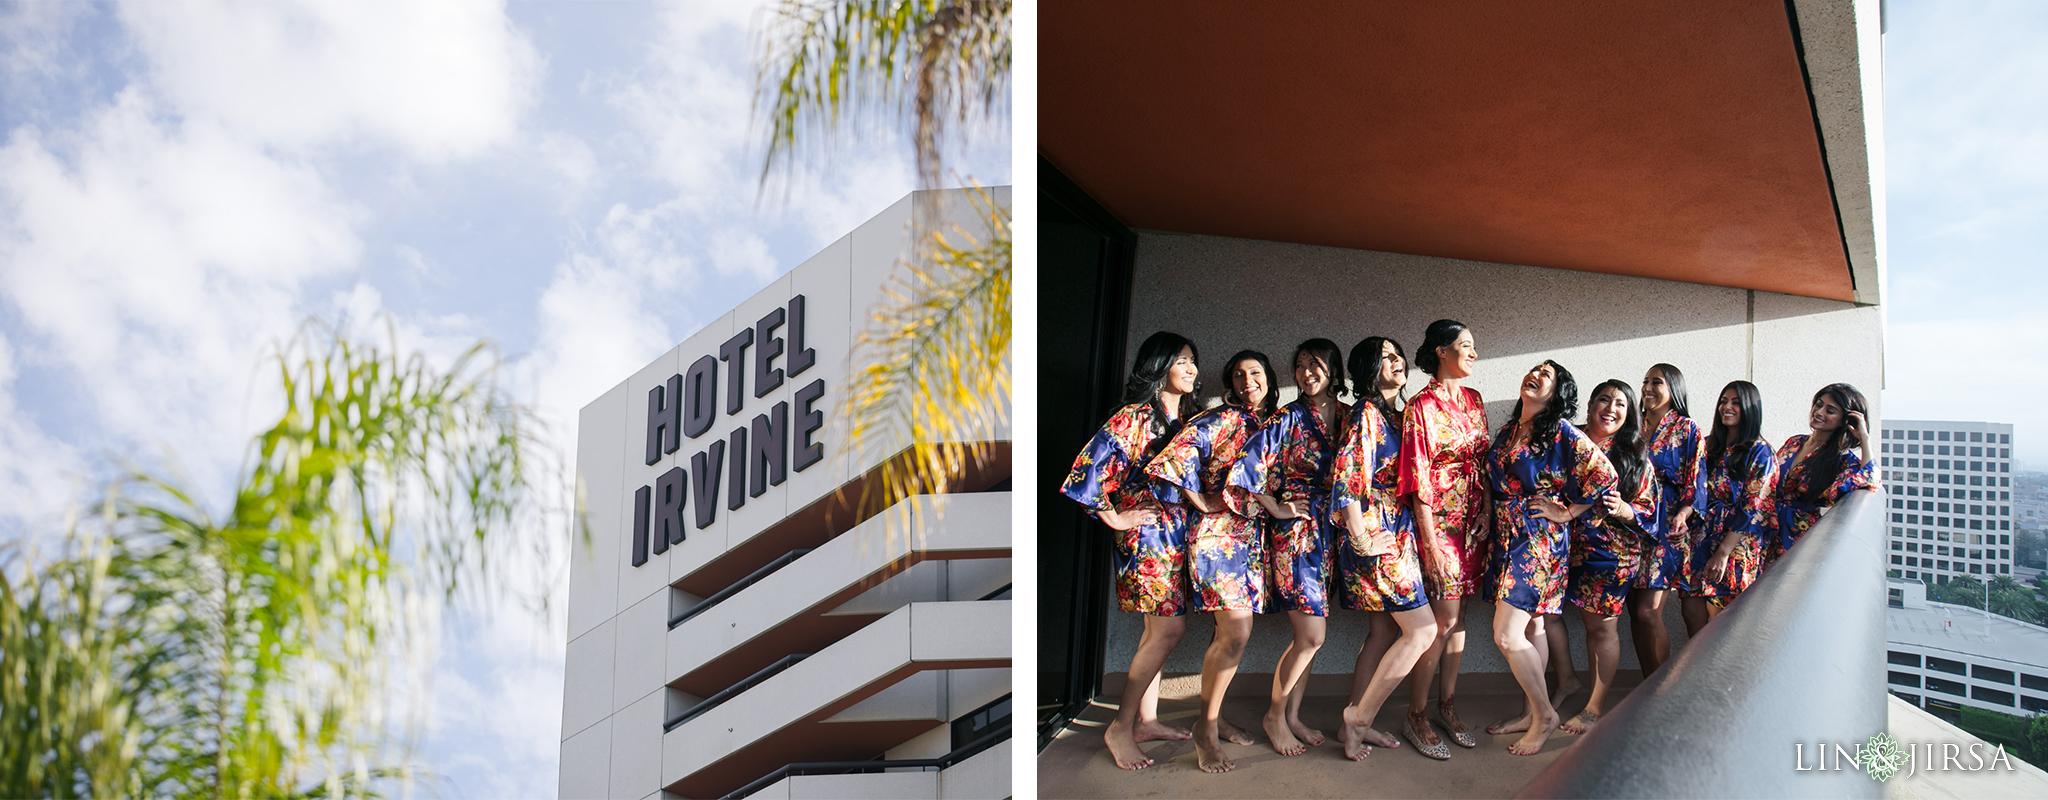 zmsantos Hotel Irvine Punjabi Hindu Indian Wedding Photography